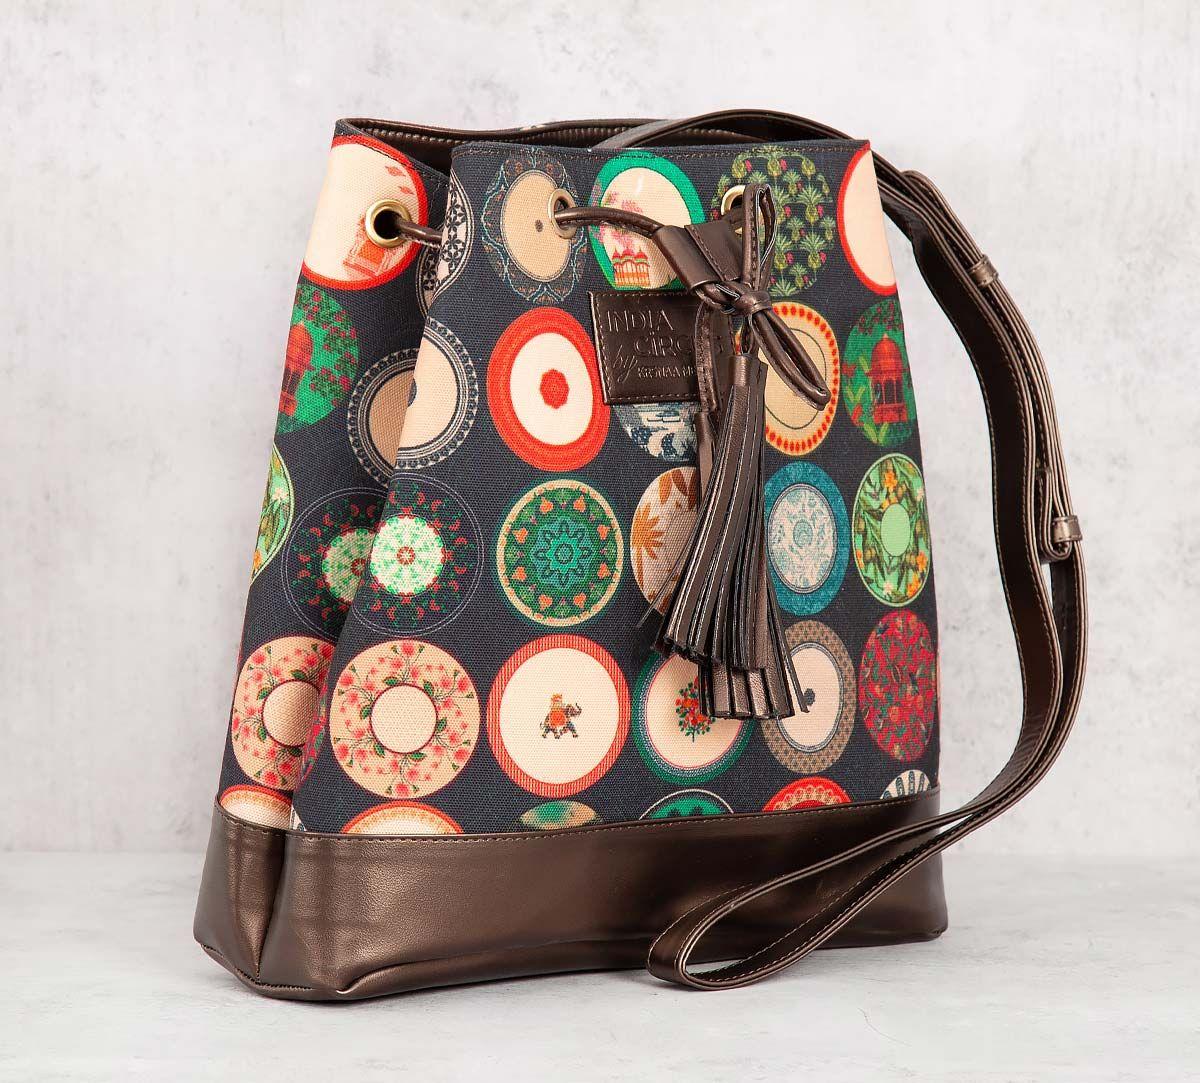 India Circus Platter Portrayal Hobo Bag